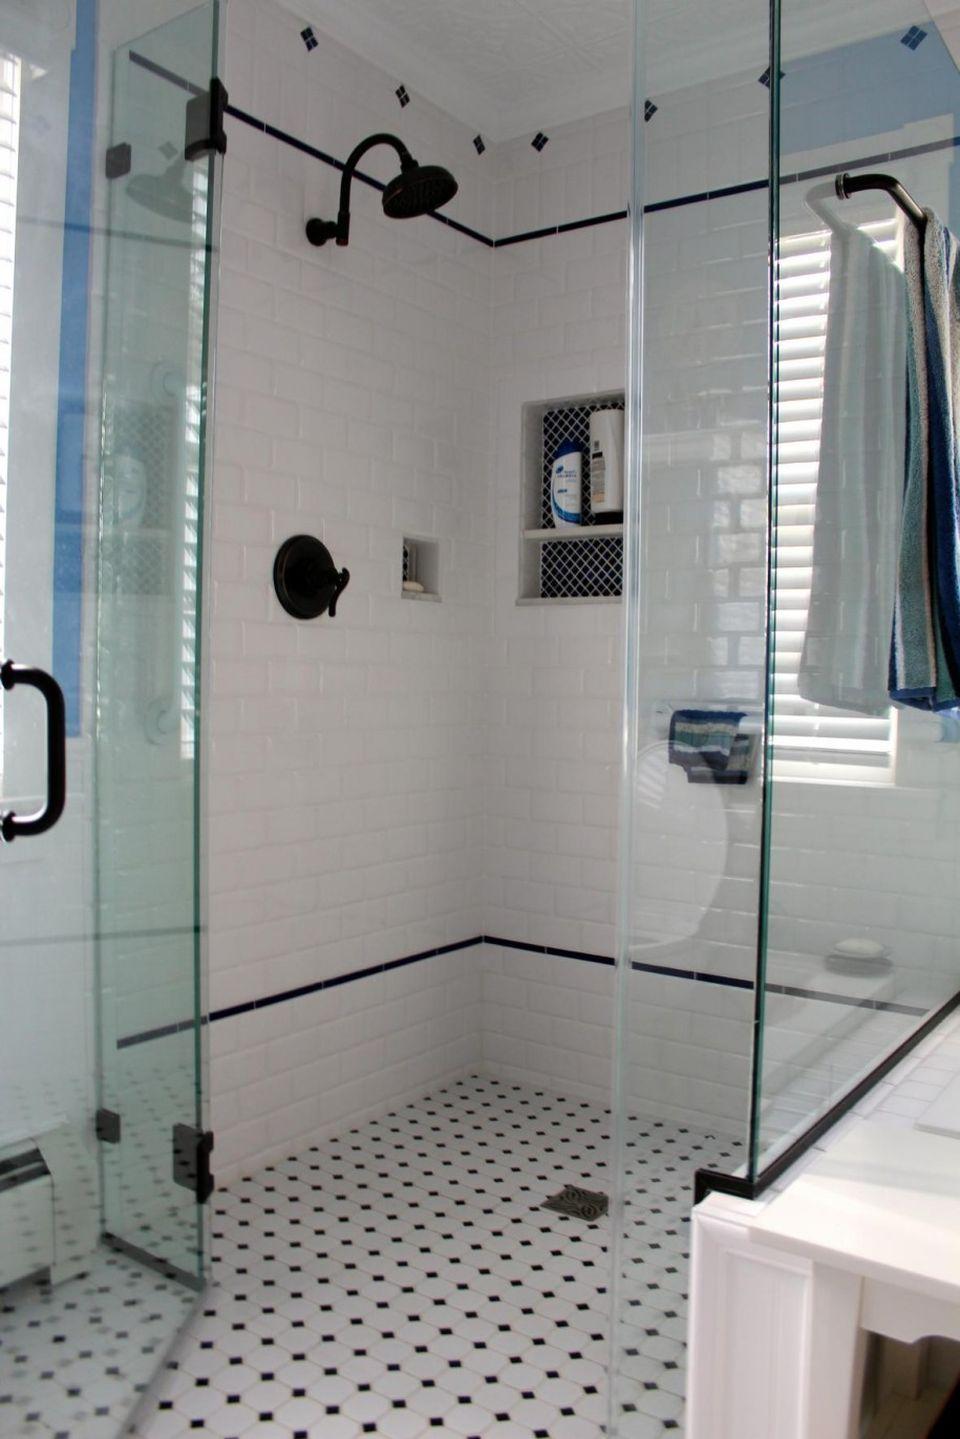 31 Bathroom Tile Ideas Make It Fresh And Not Boring Black White Tiles Bathroom White Bathroom Tiles White Subway Tile Bathroom